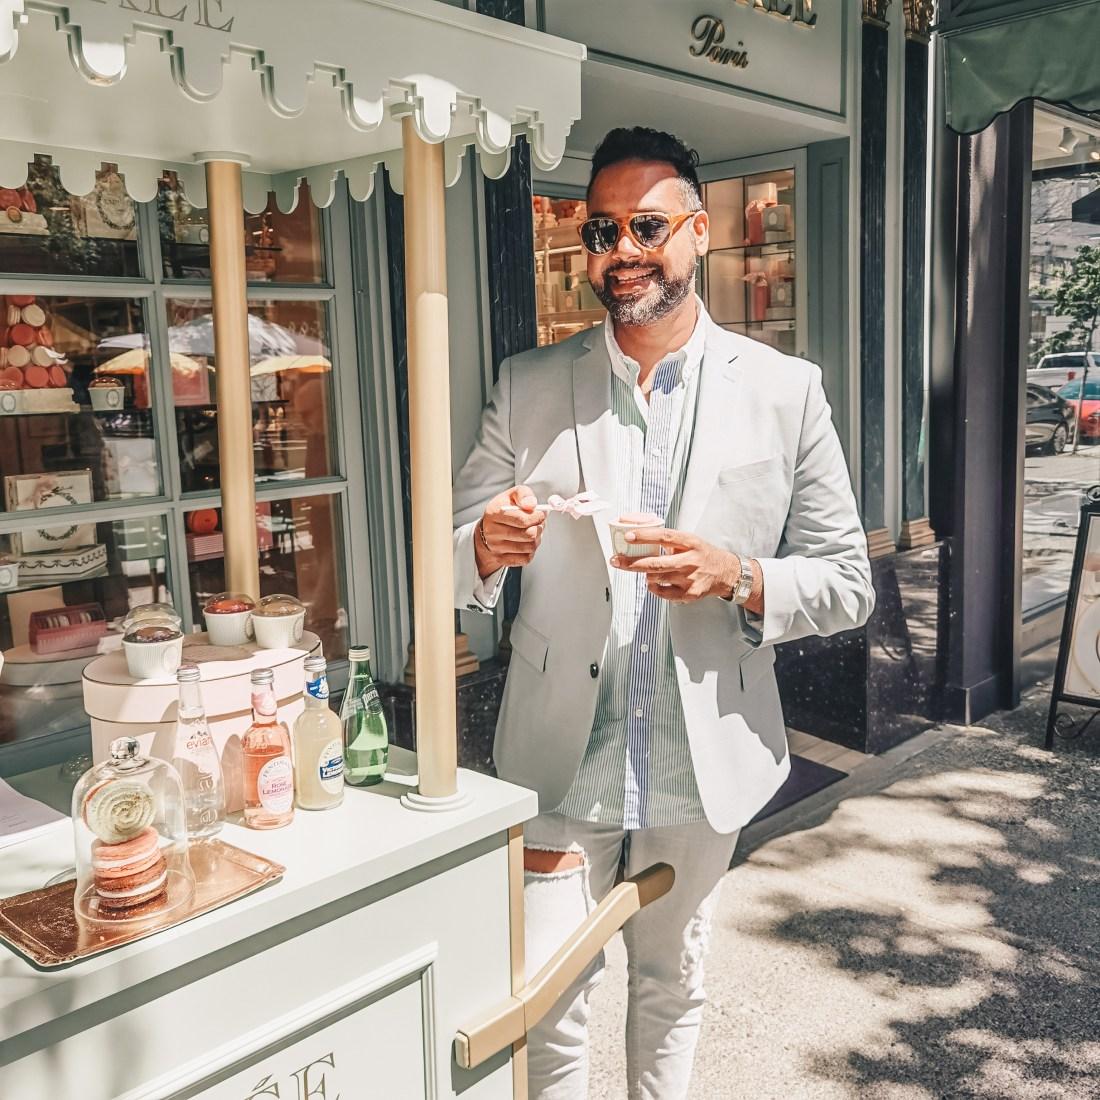 Laduree Vancouver - Robson Street - French Patisserie - Ice Cream